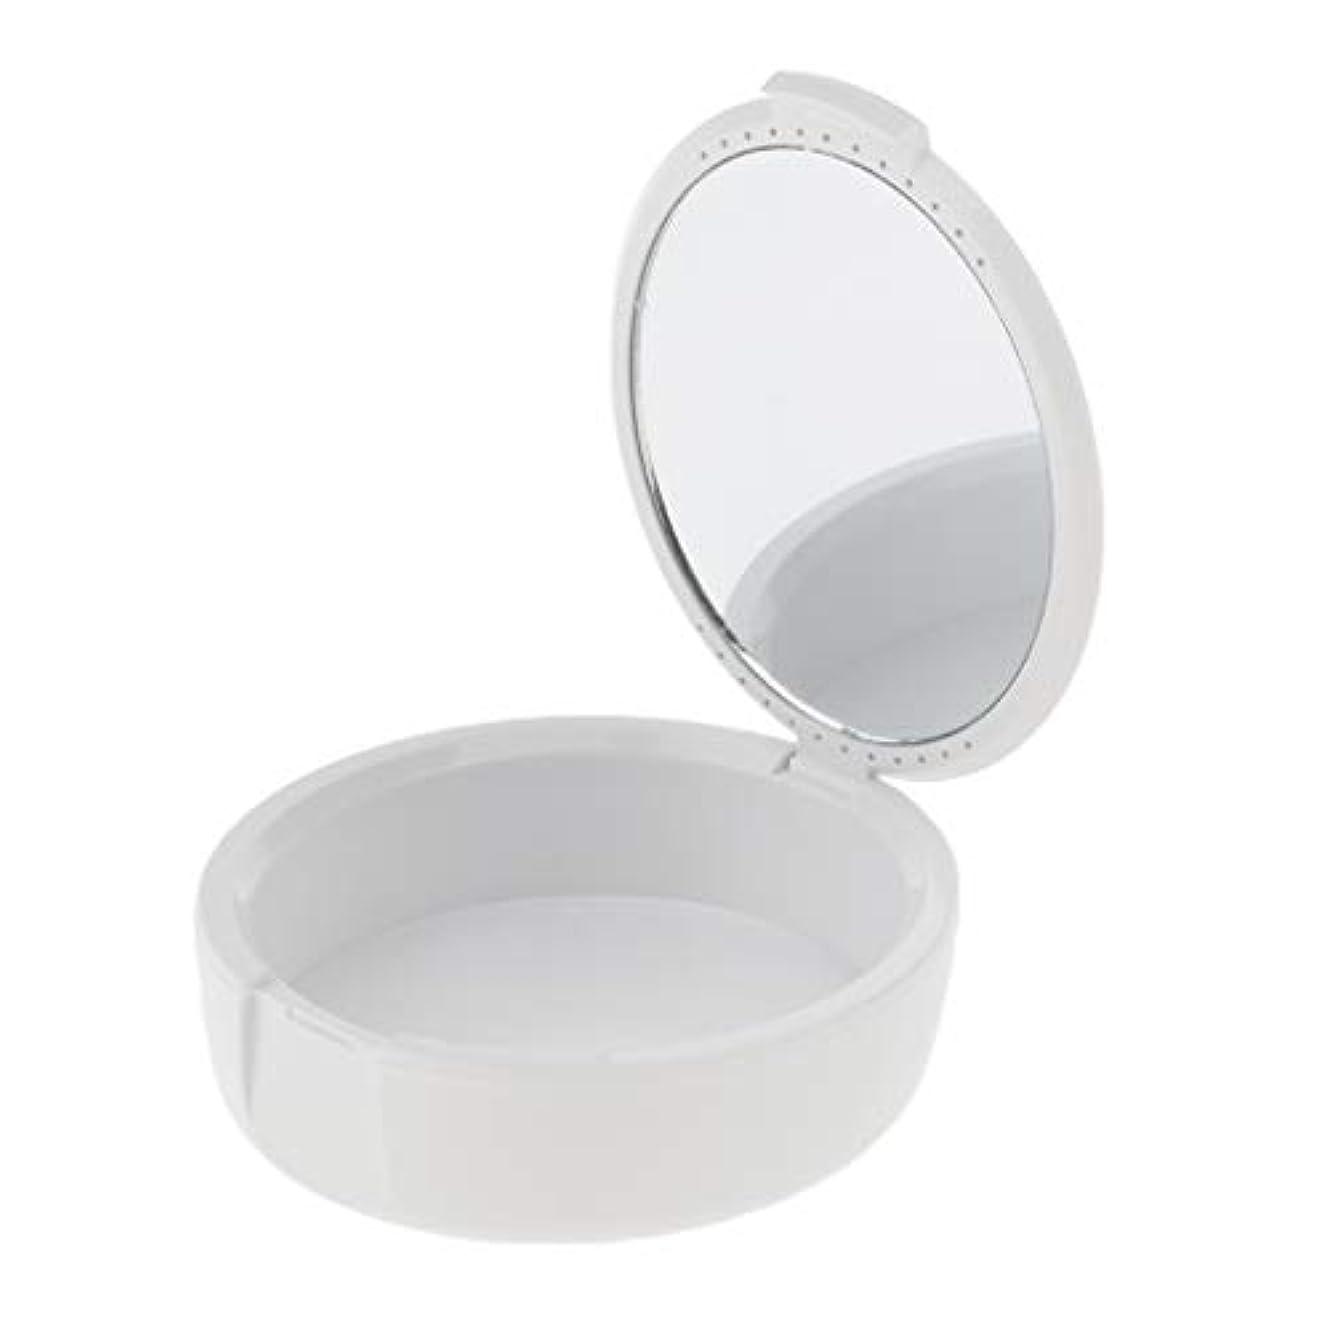 Baoblaze 義歯ケース マウスガードケース ミラー付き 入れ歯ケア リテーナー 収納ケース 2色選べ - 白